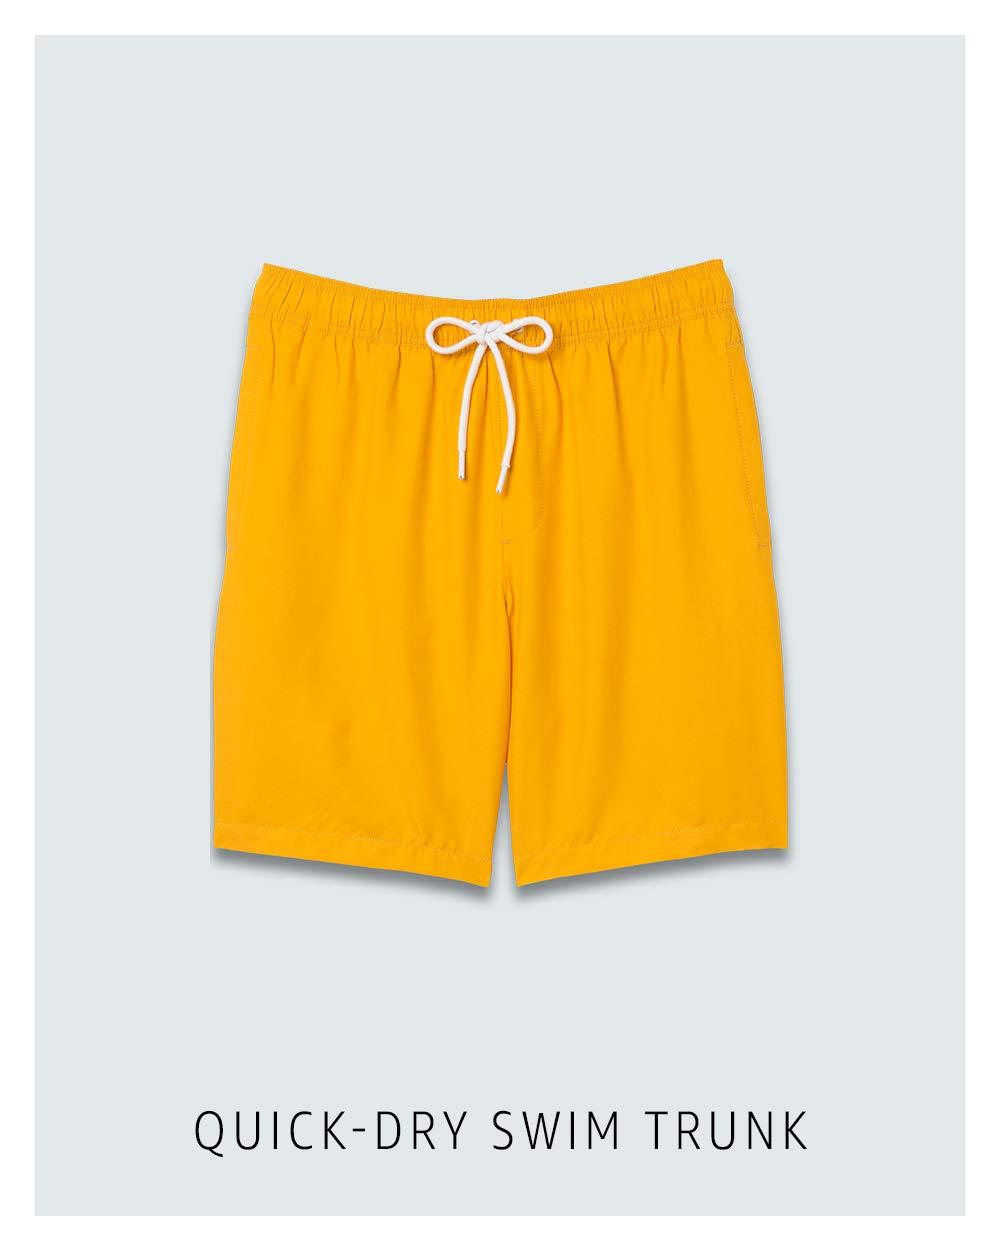 Quick-dry swim trunk